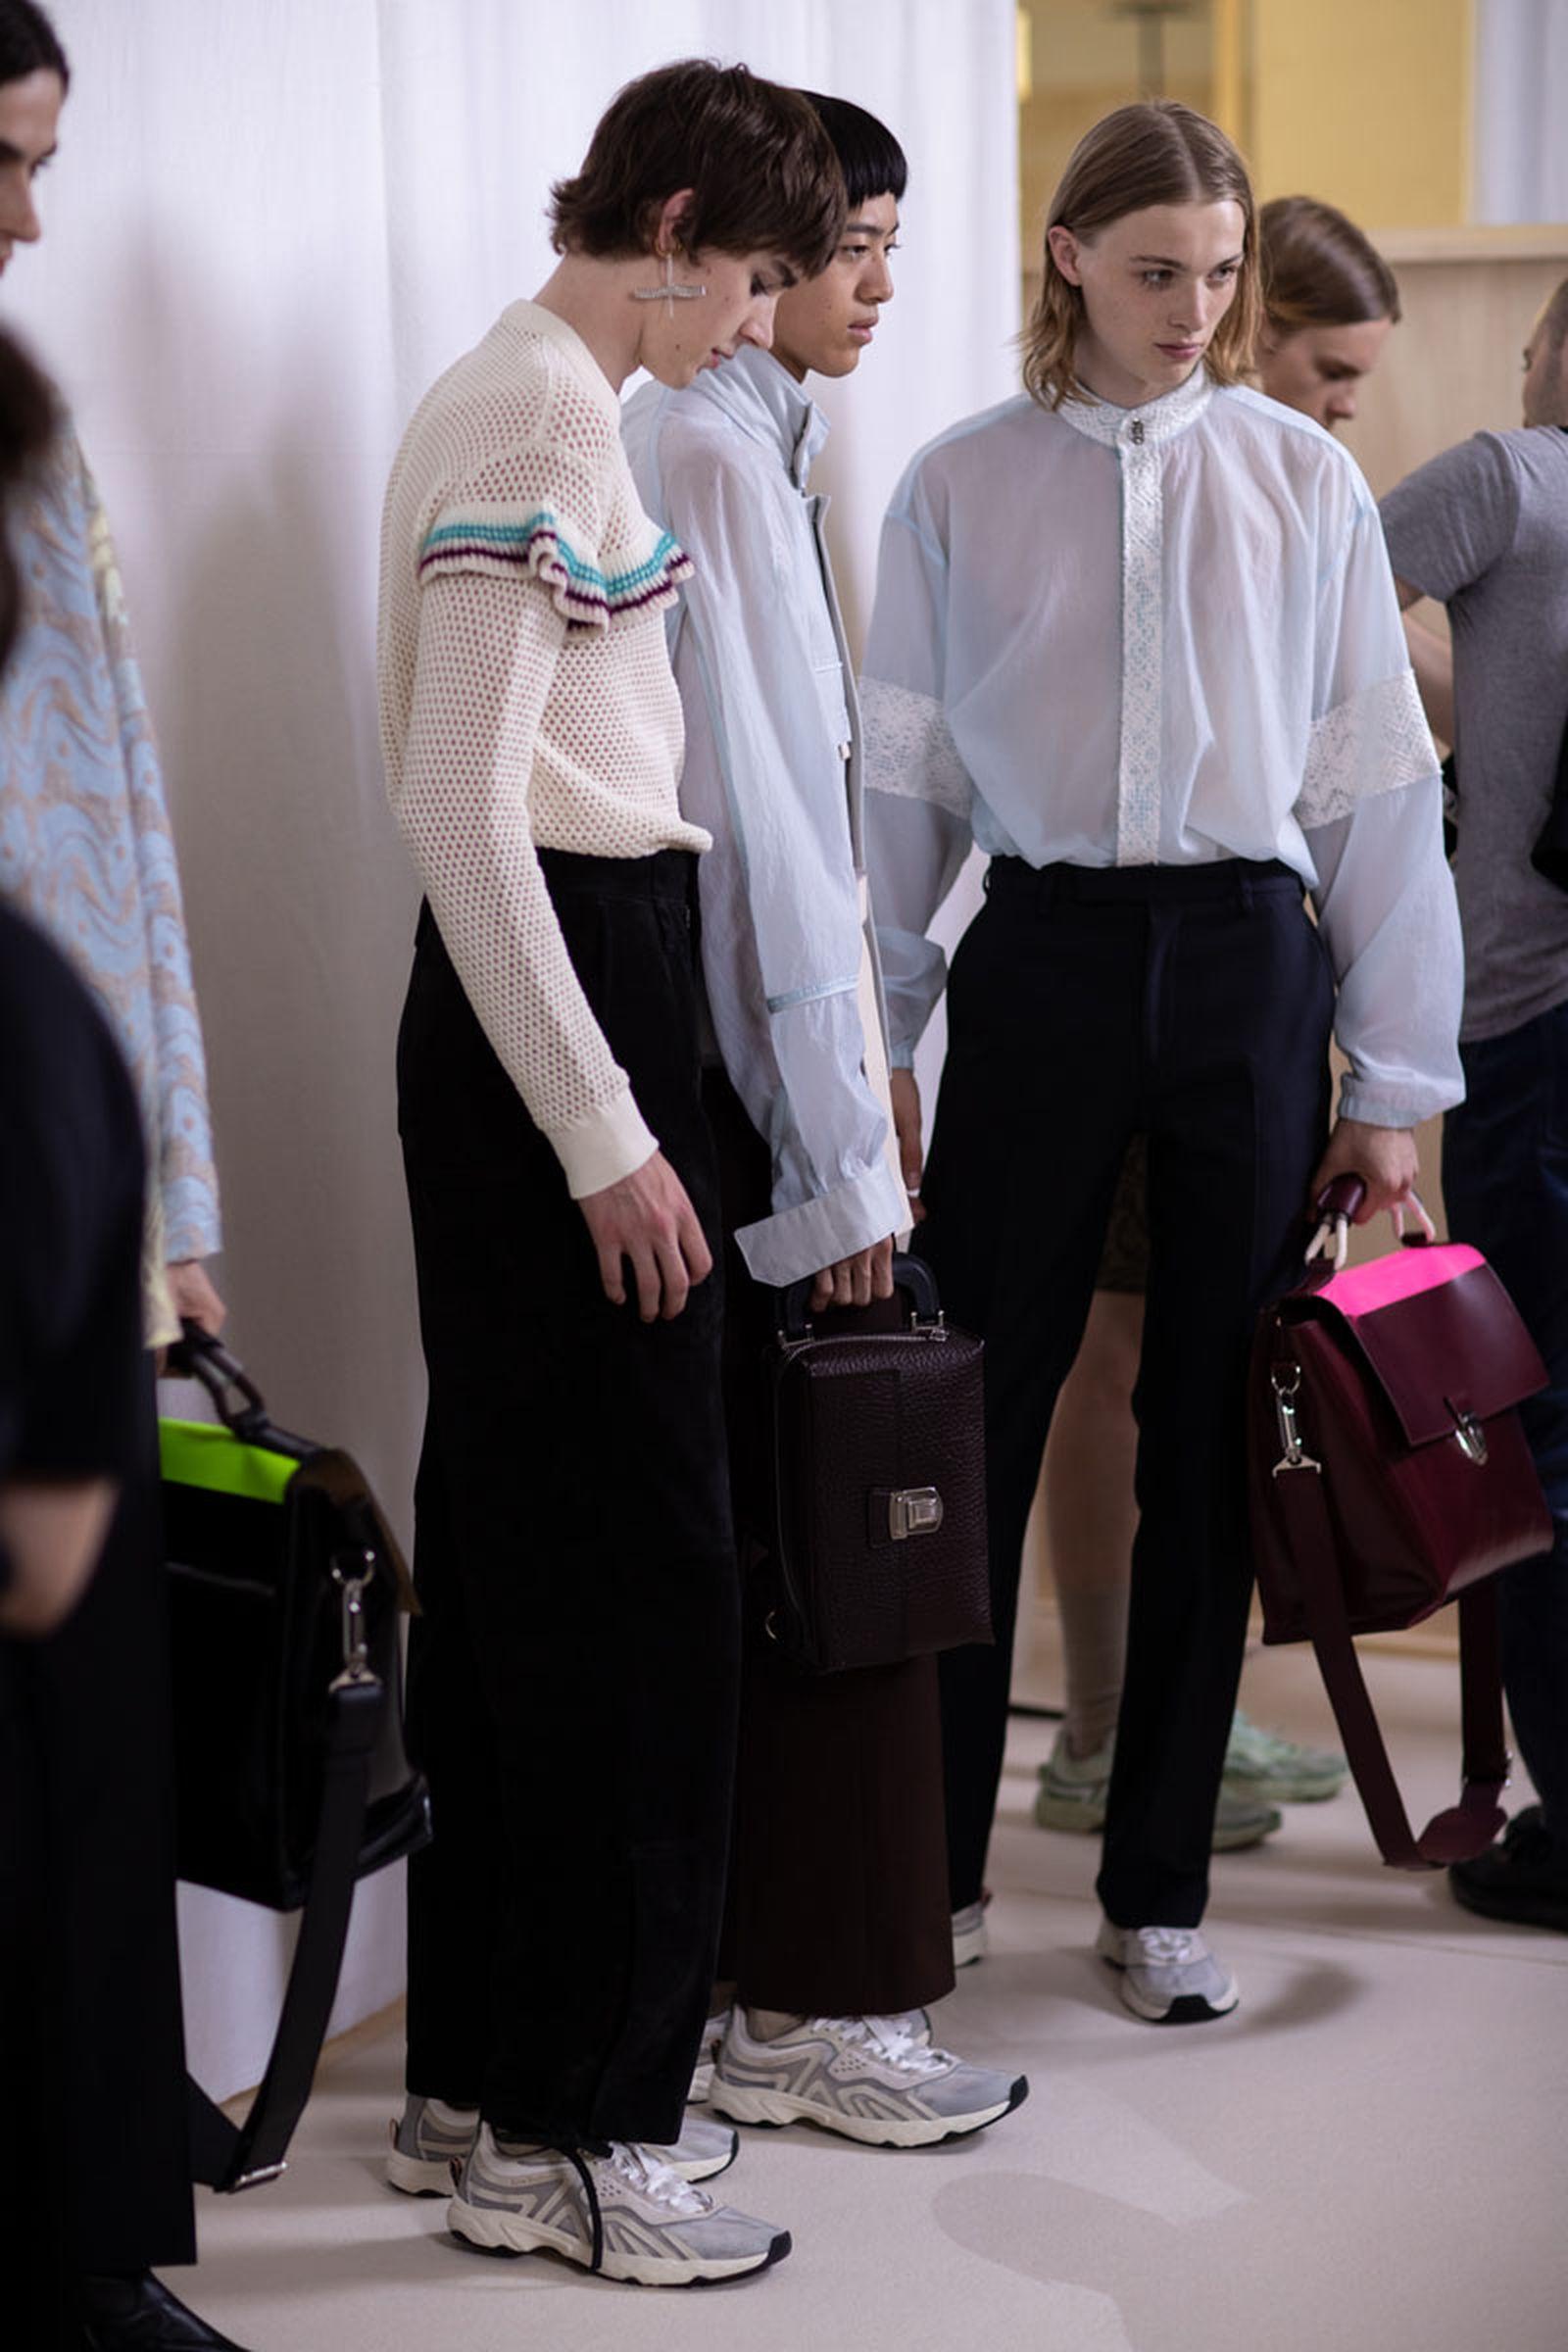 Paris AcneStudios EvaAlDesnudo ForWeb 03 Acne Studios paris fashion week runway